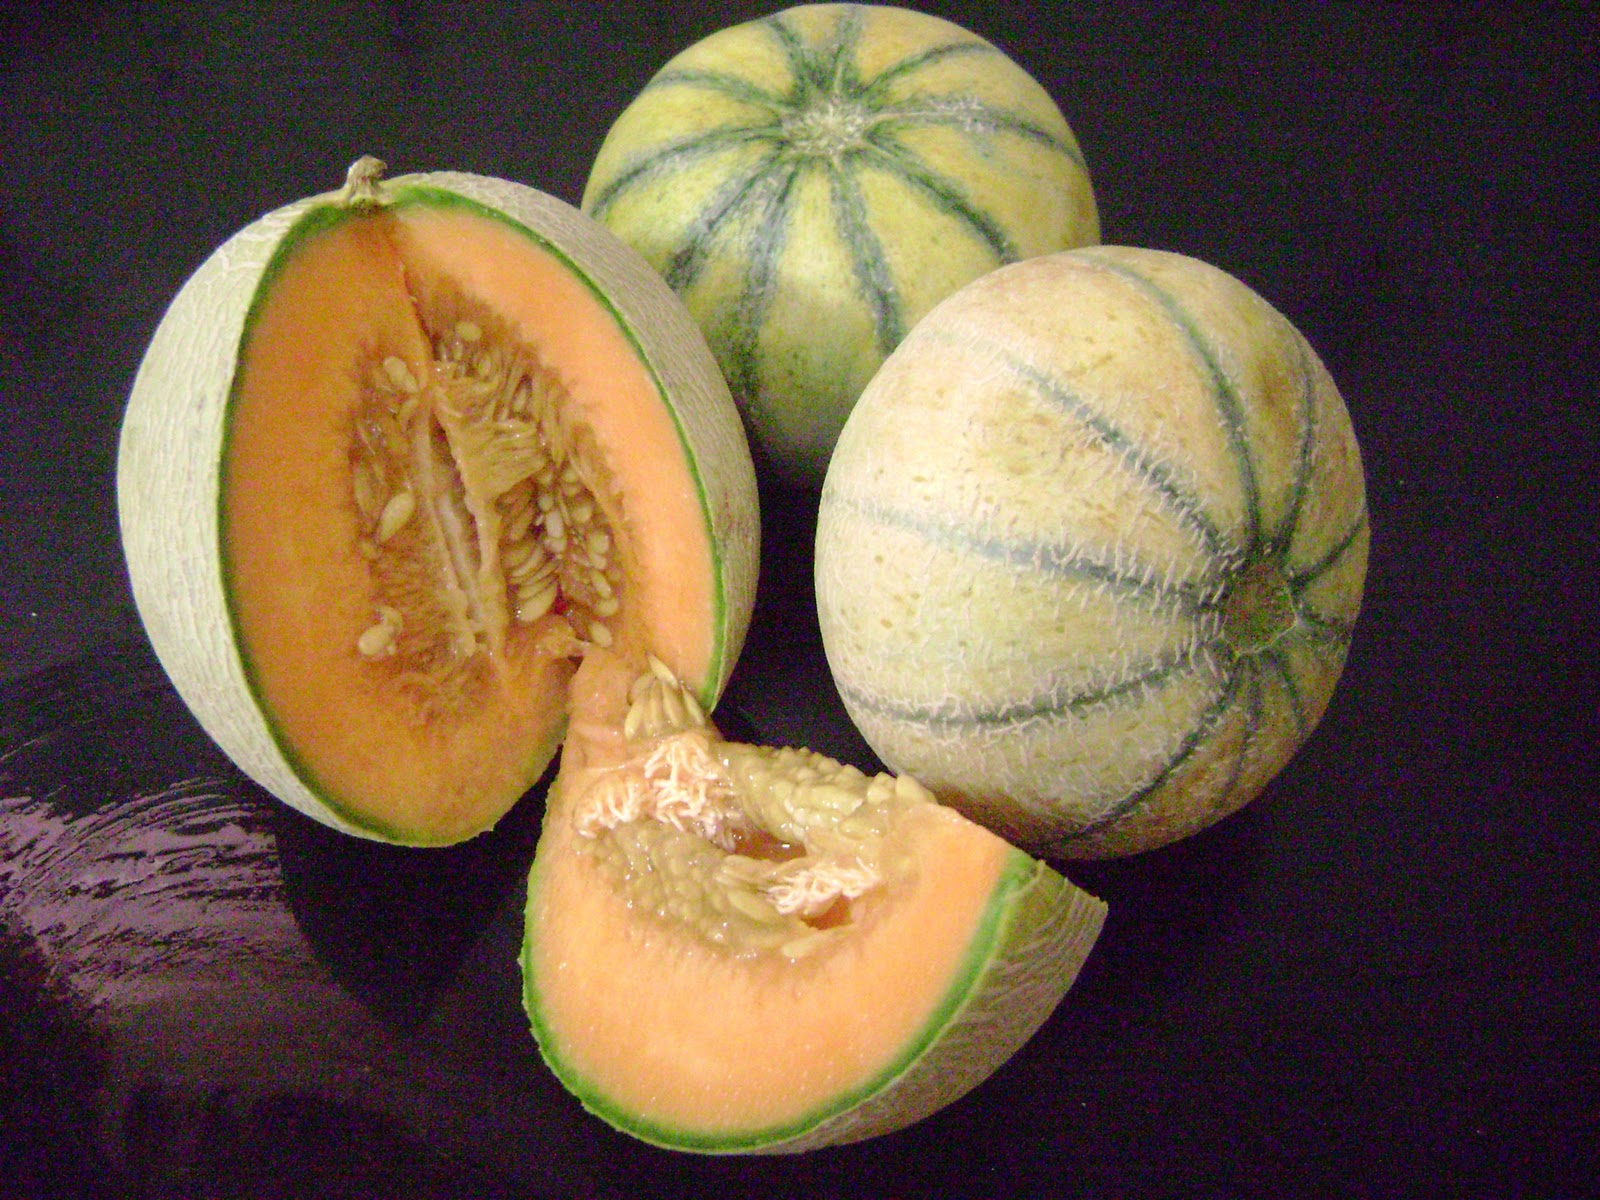 Muskmelon, Cantaloupe | HowStuffWorks